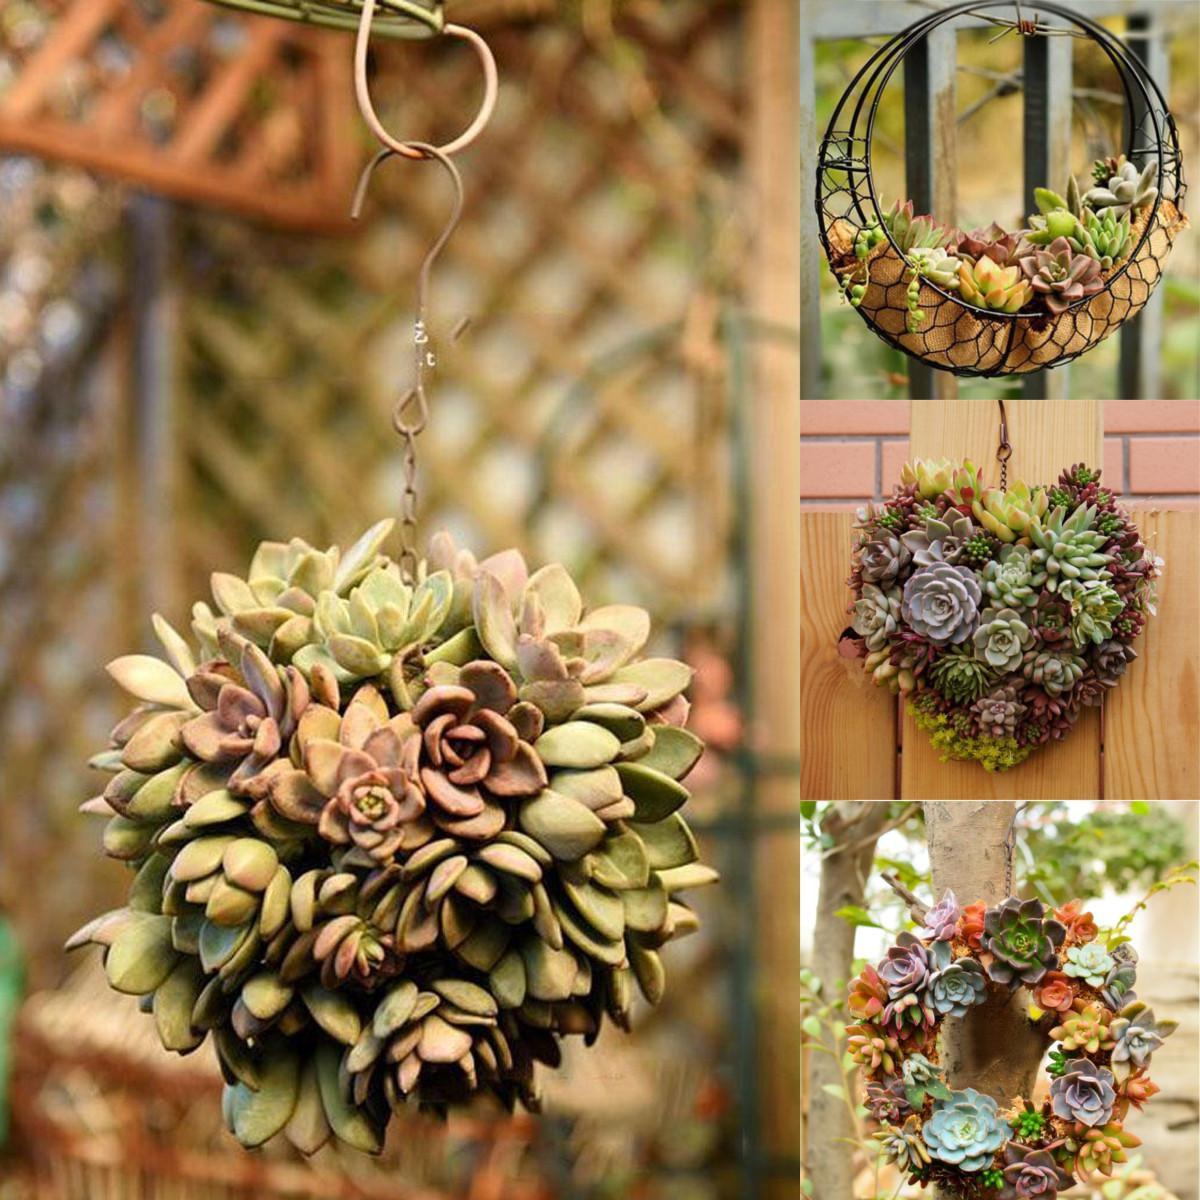 Christmas Succulent Planters.Hanging Flower Pot Iron Wall Succulent Planters Rustic Plant Holder Home Decor